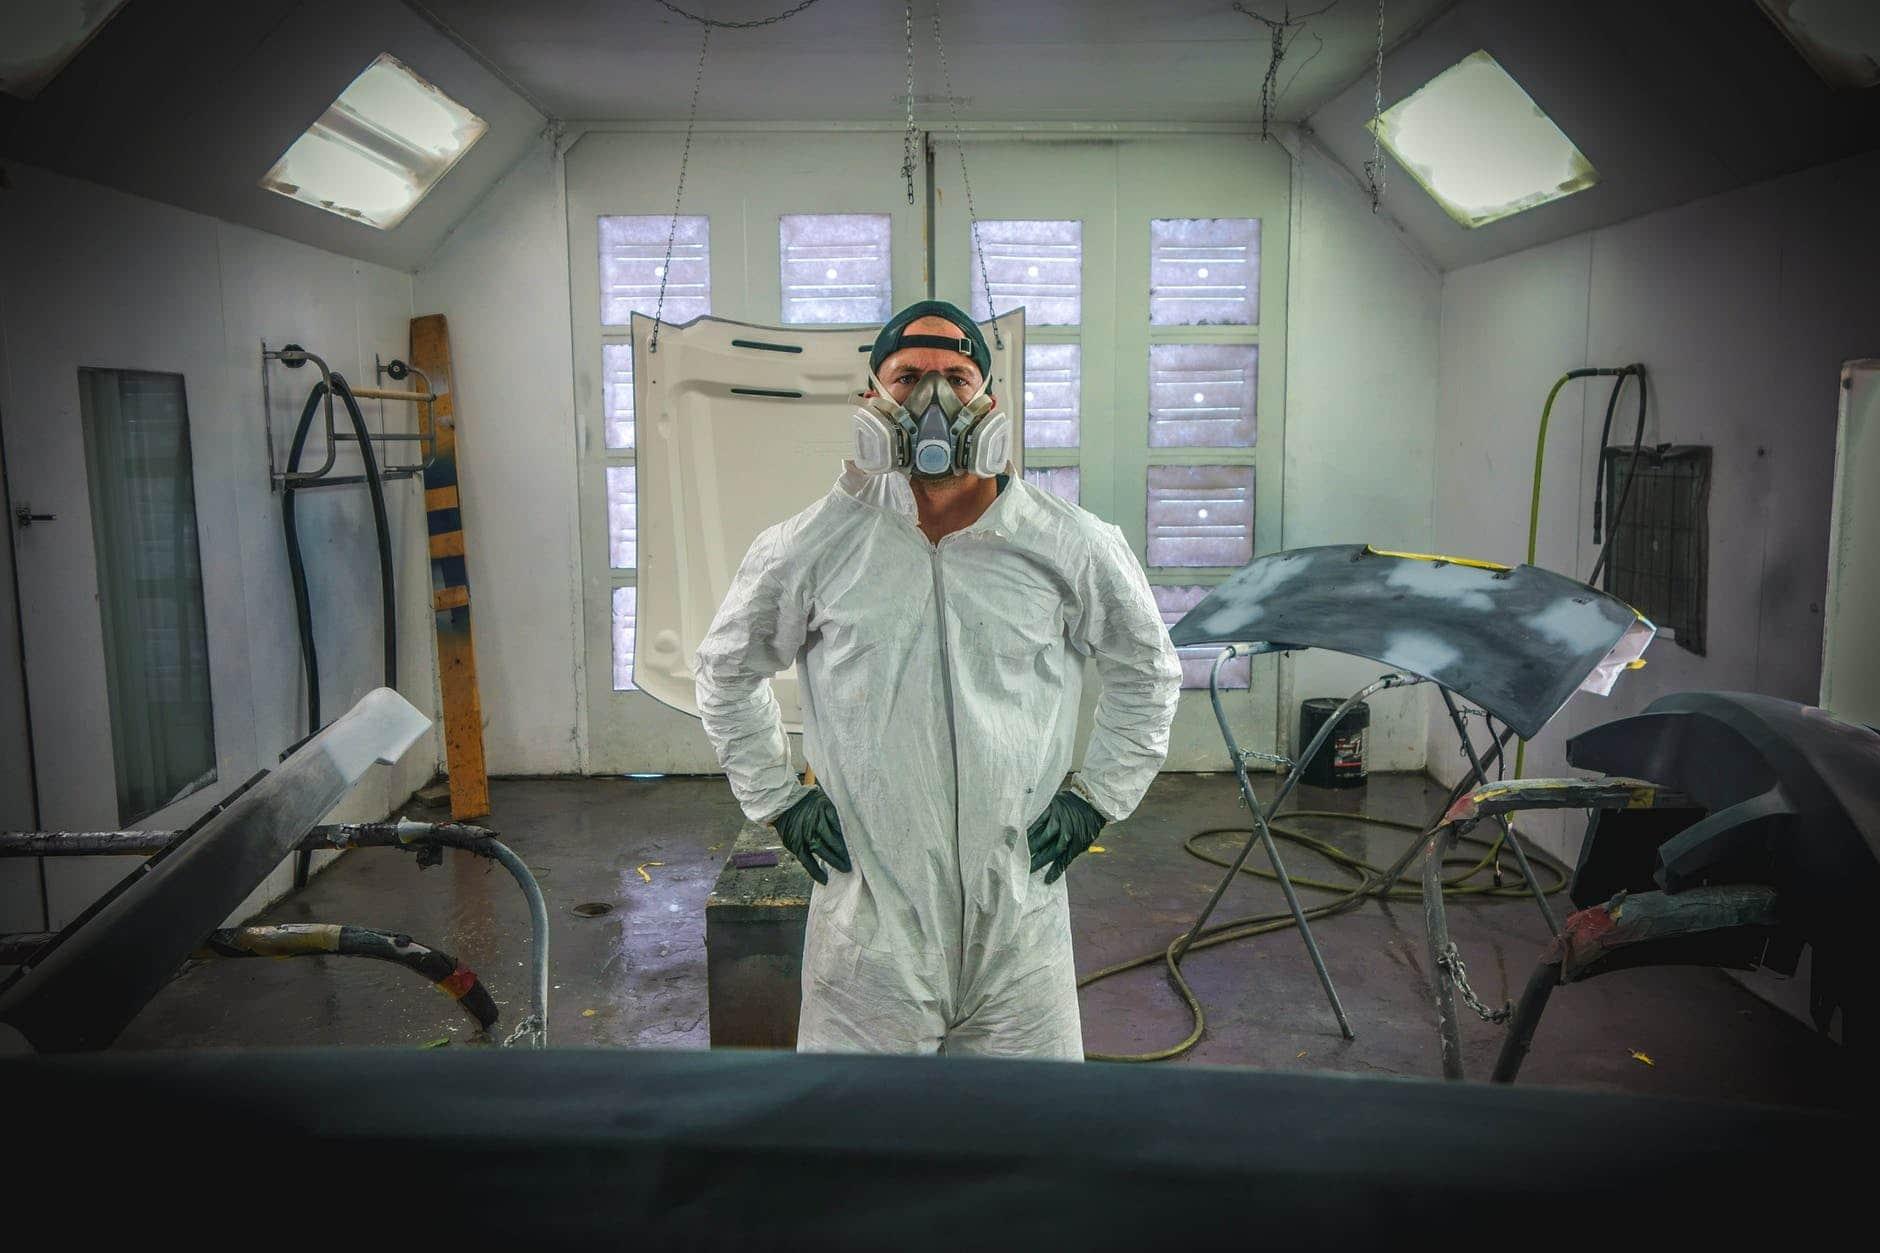 Smart Repair Mann in Werkstatt in Biberach